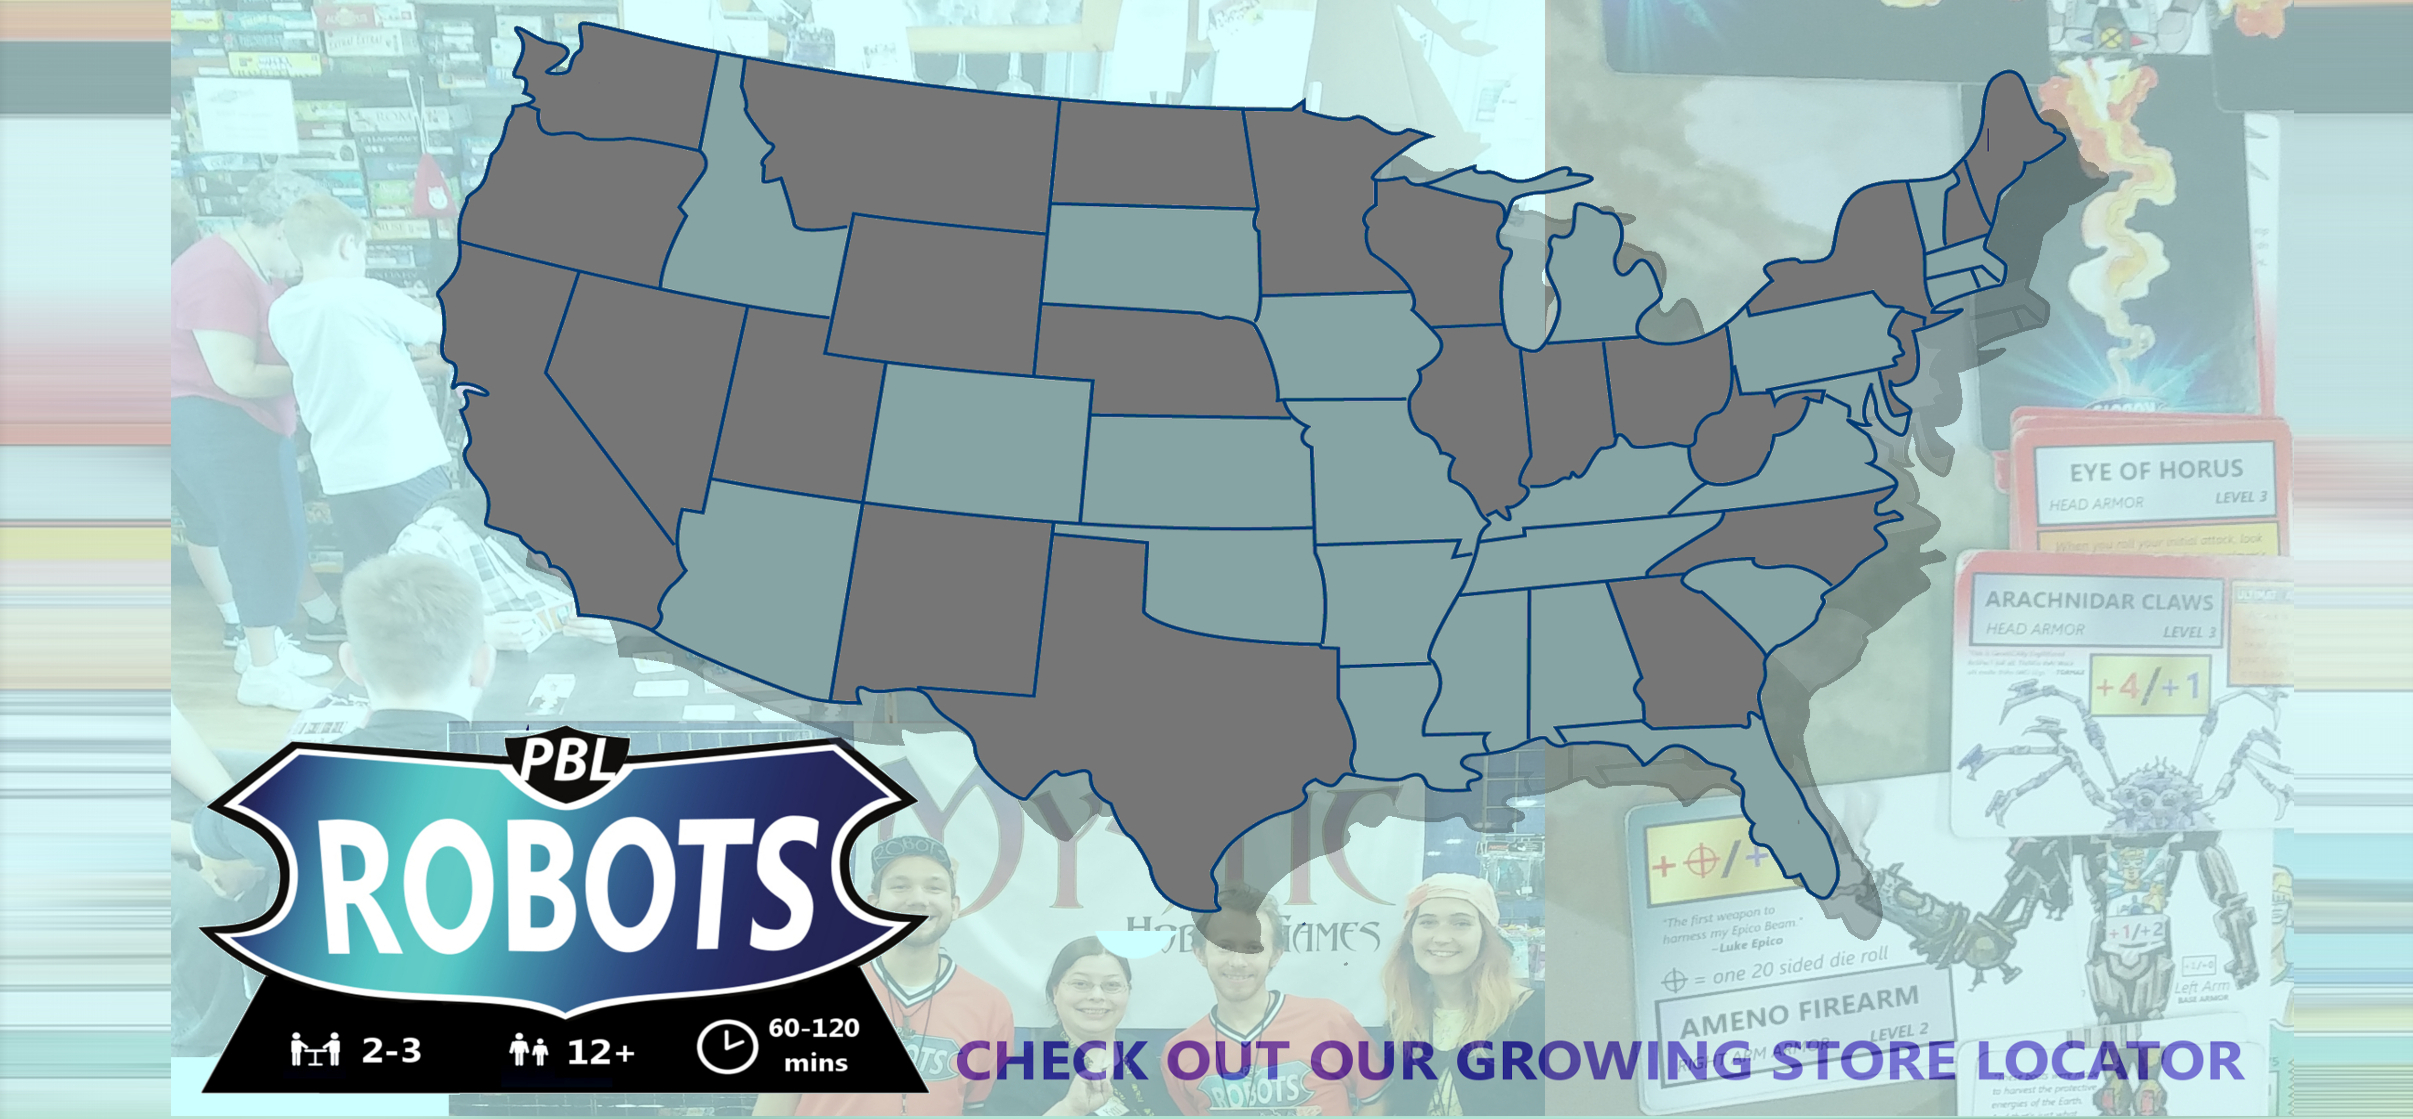 PBL Robots Store Locator